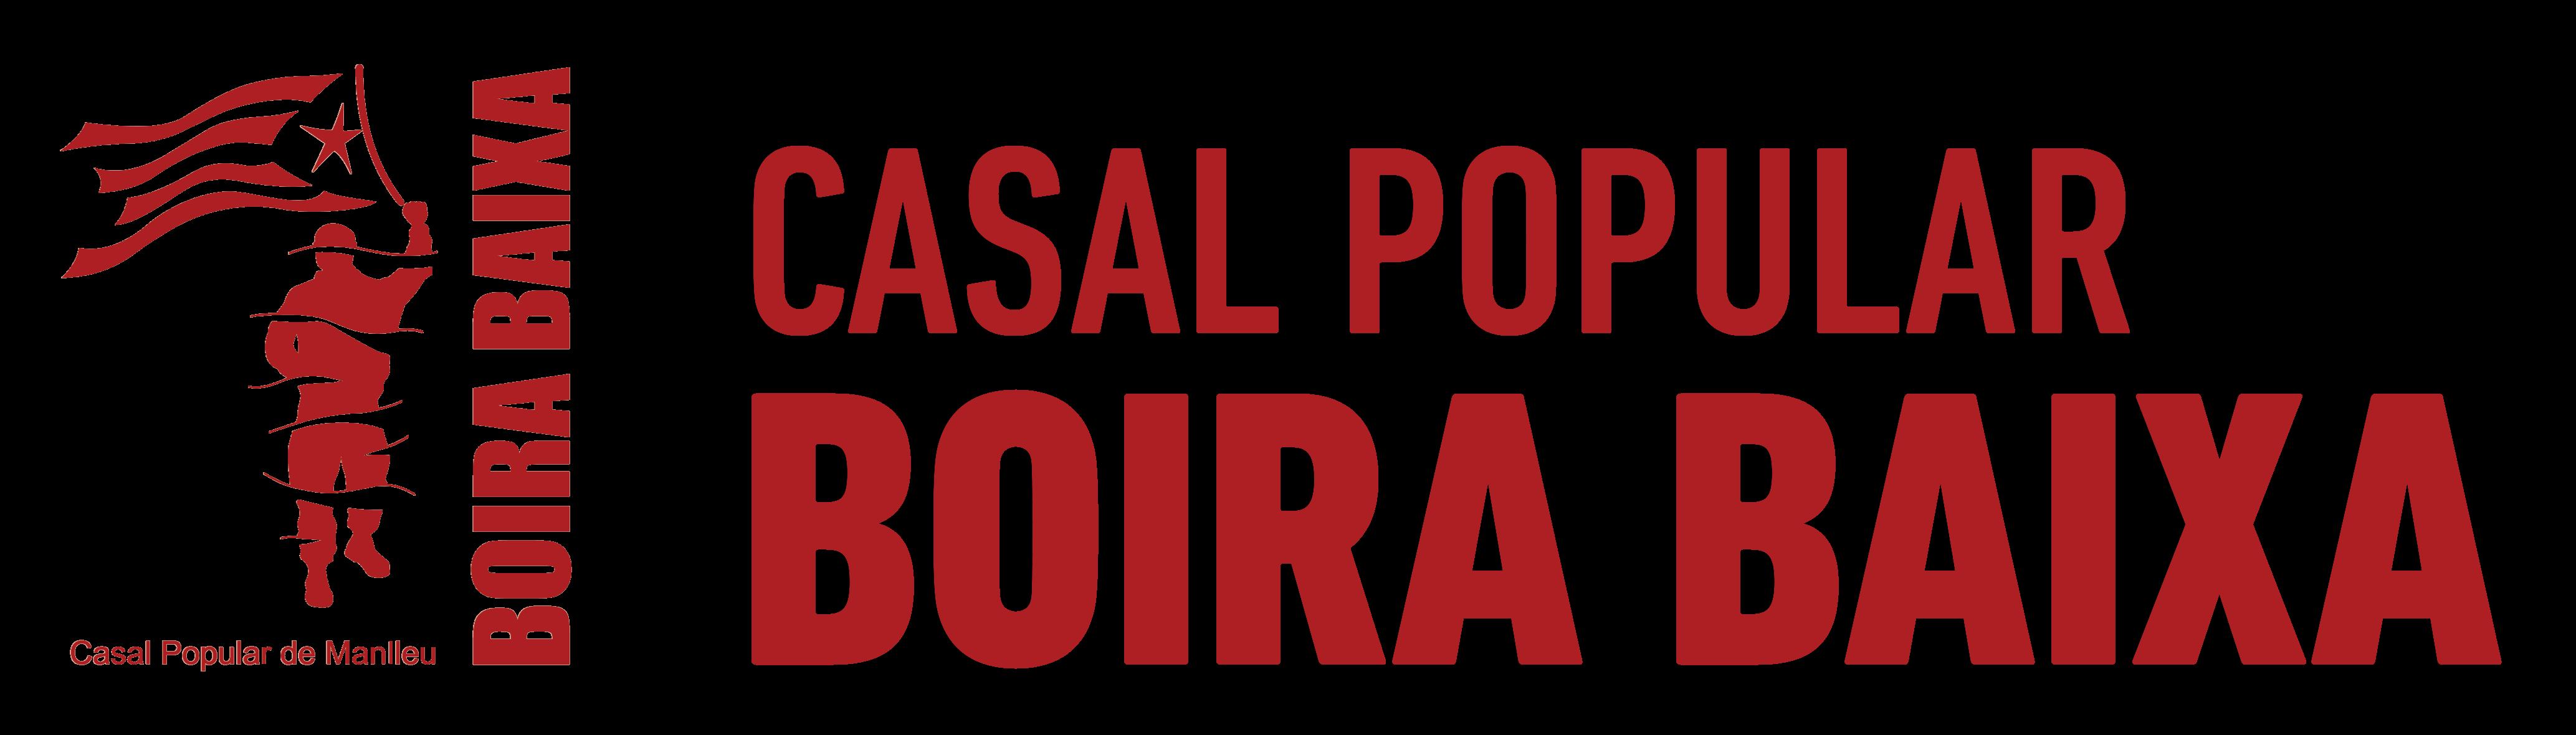 cropped-logoweb_proporcions_wordpress-1.png